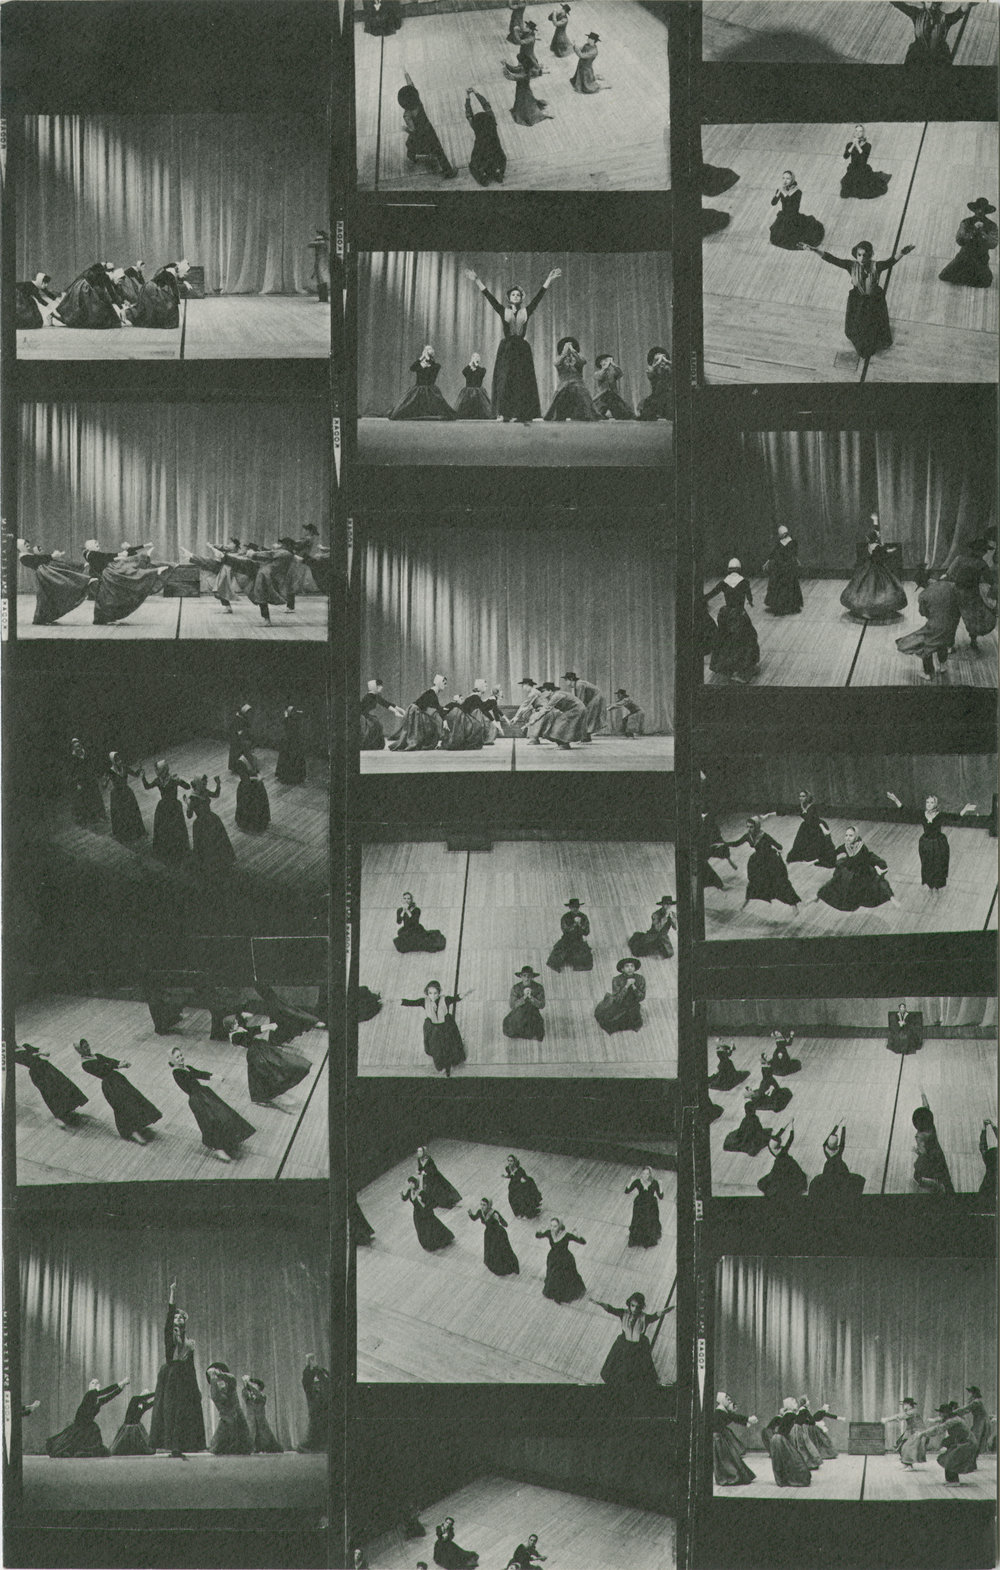 UDG_1965_DancePrograms-001-01.jpg